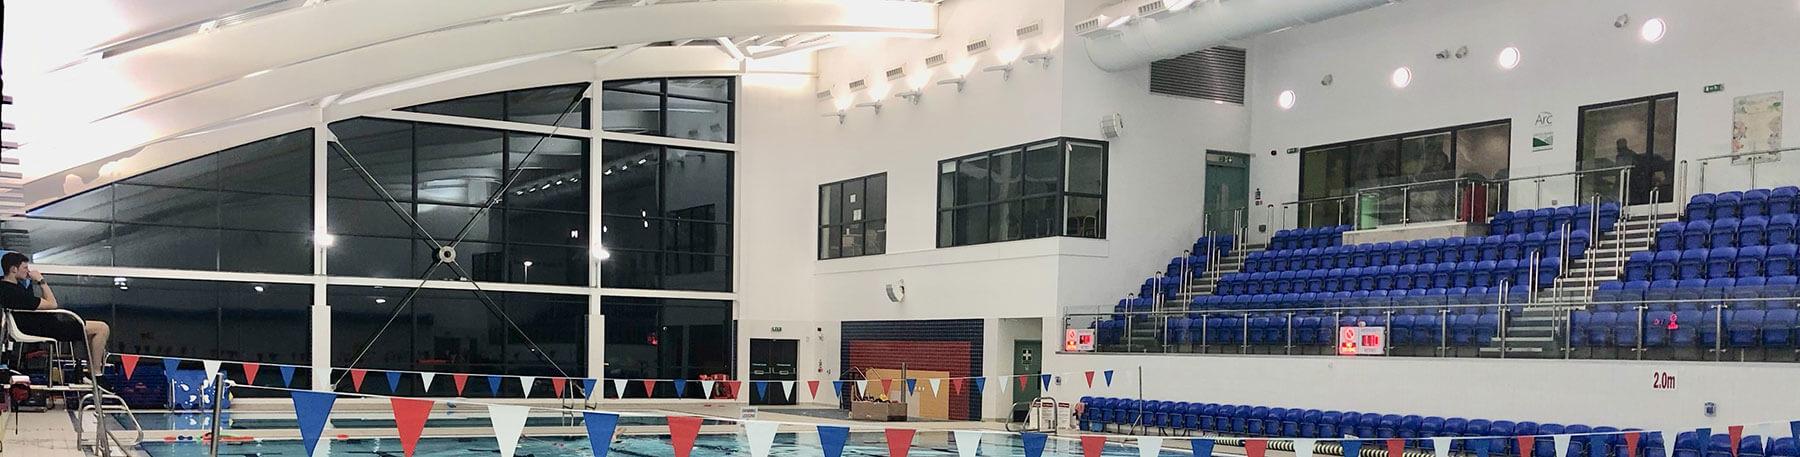 ARC Leisure Centre Matlock swimming pool hall led lights saving energy